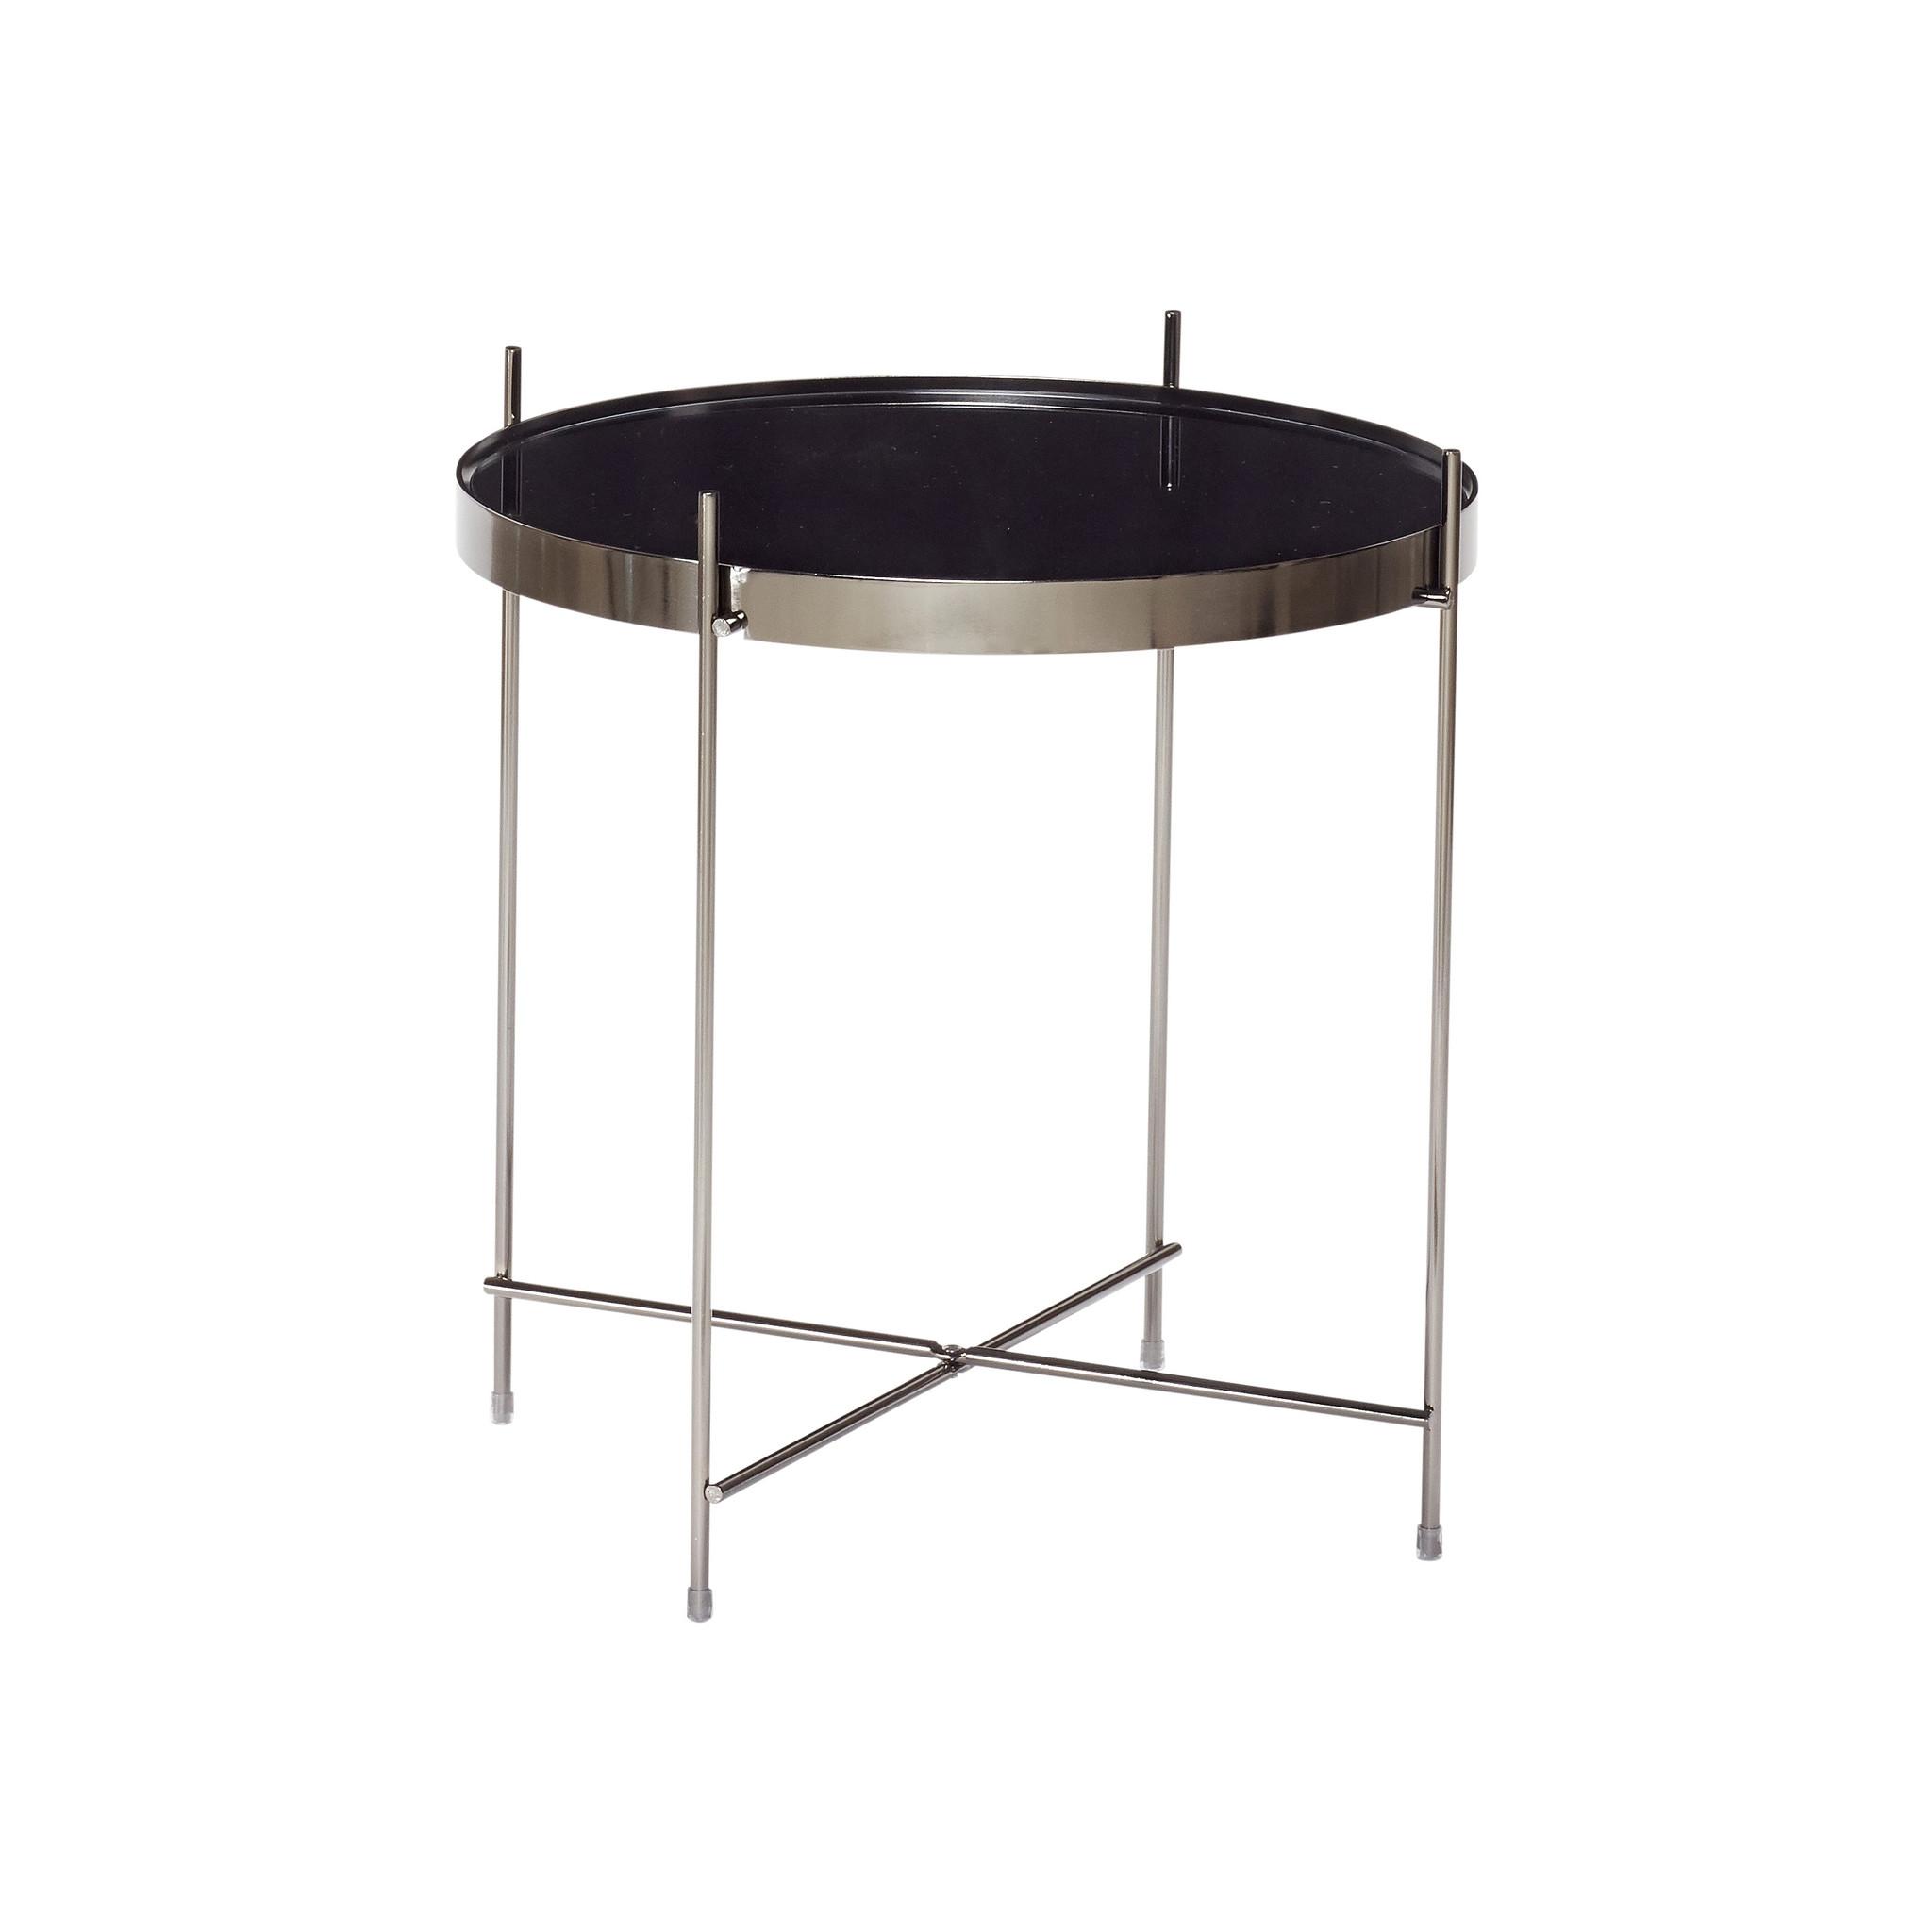 Hubsch Tafel, rond, metaal / spiegel-930402-5712772058565